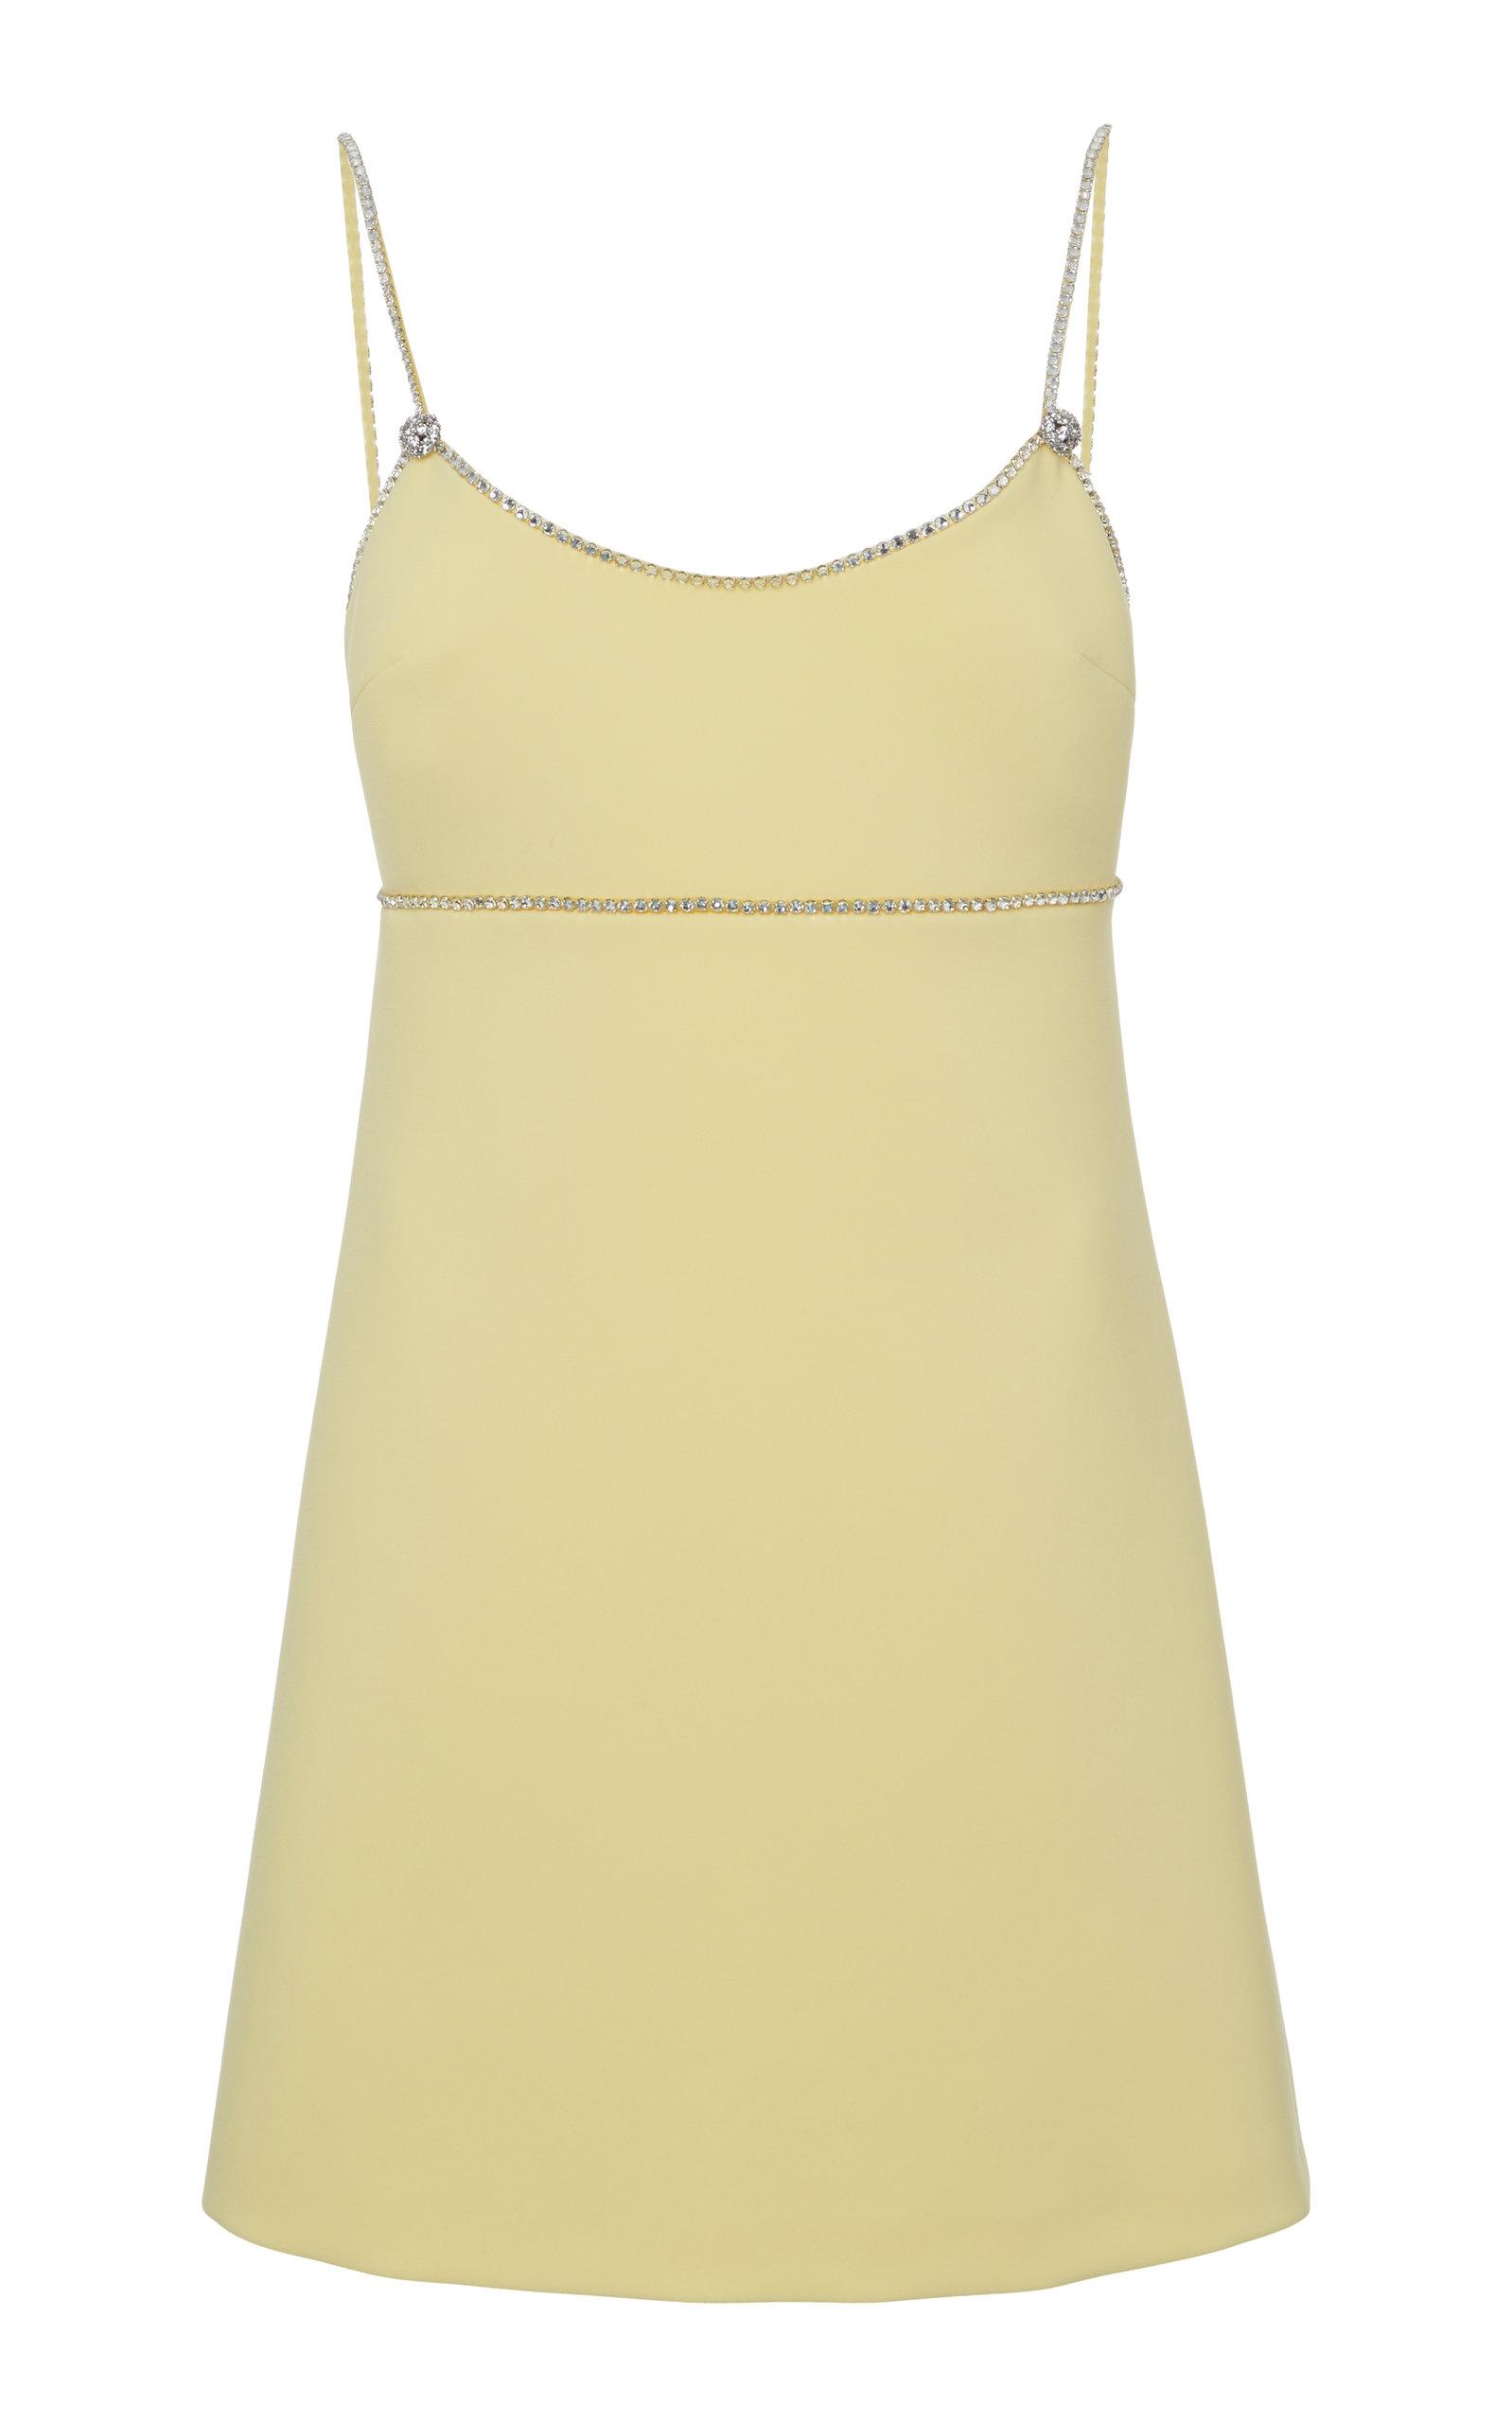 Buy Miu Miu Crystal Embellished Cady Mini Dress online, shop Miu Miu at the best price